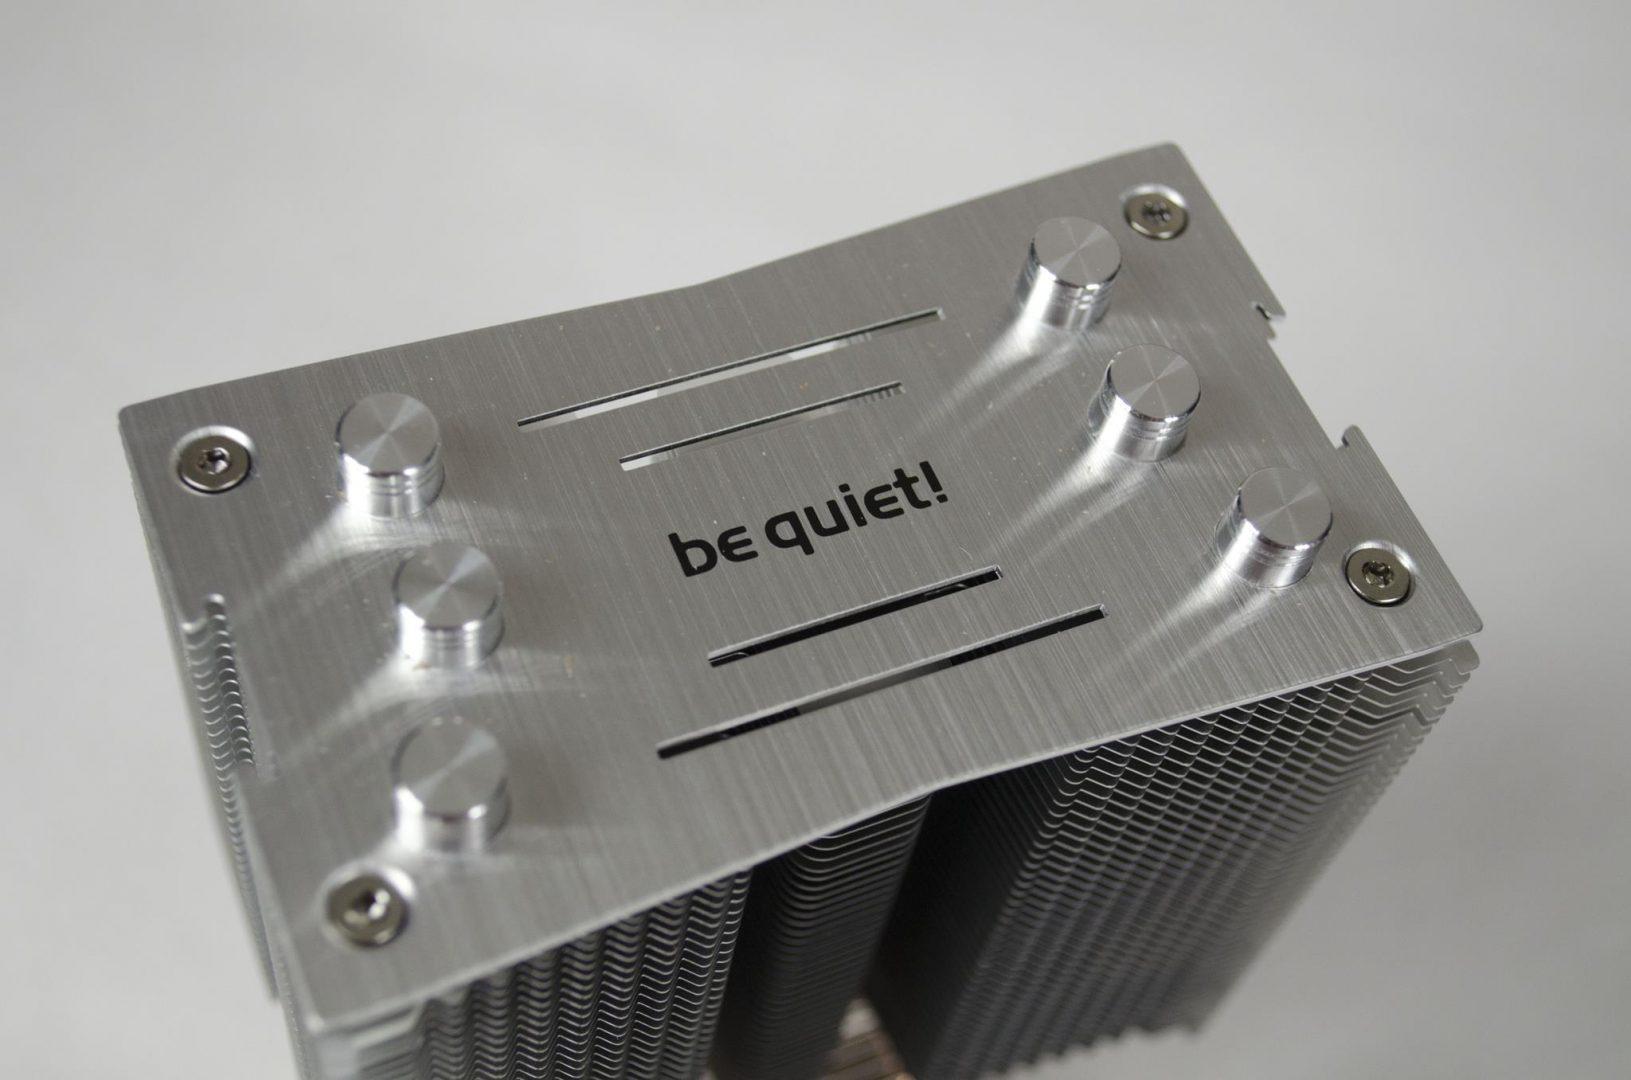 be quiet! Pure Rock Slim CPU Cooler Review